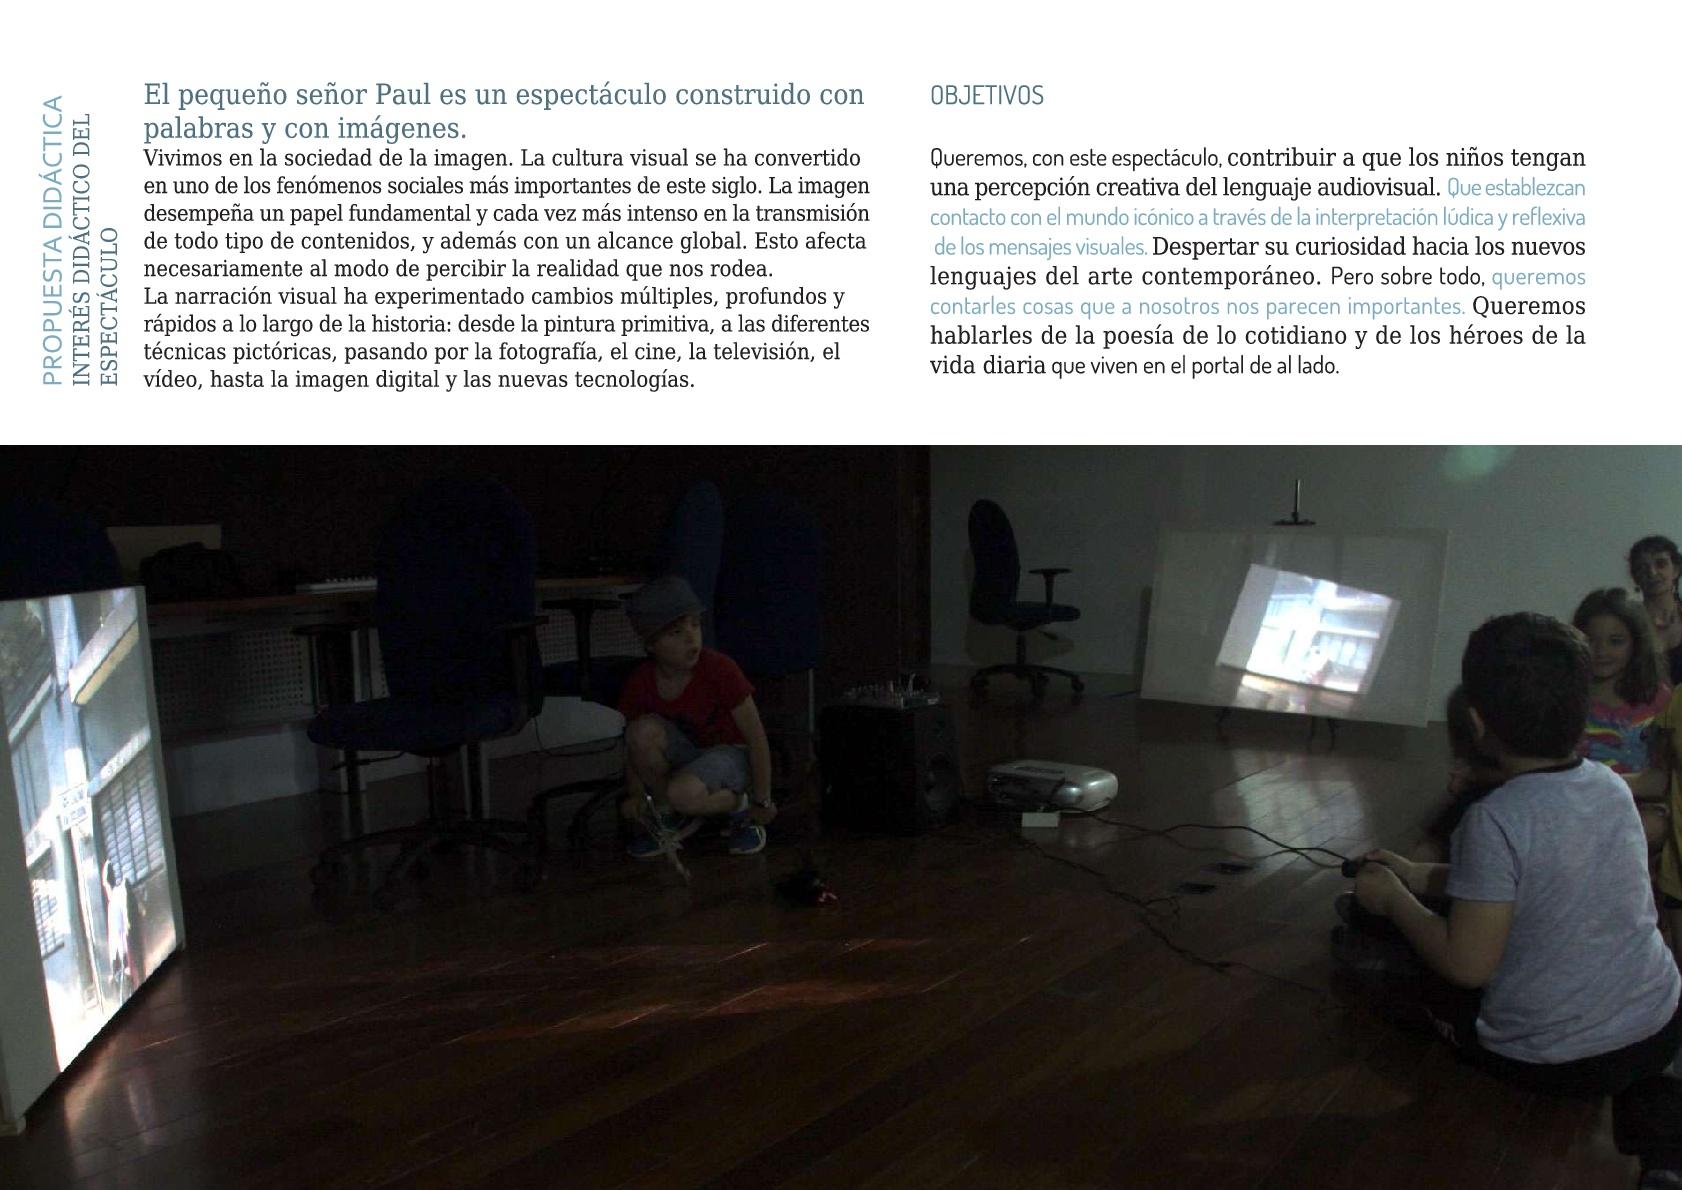 paul-guiadidactica-010